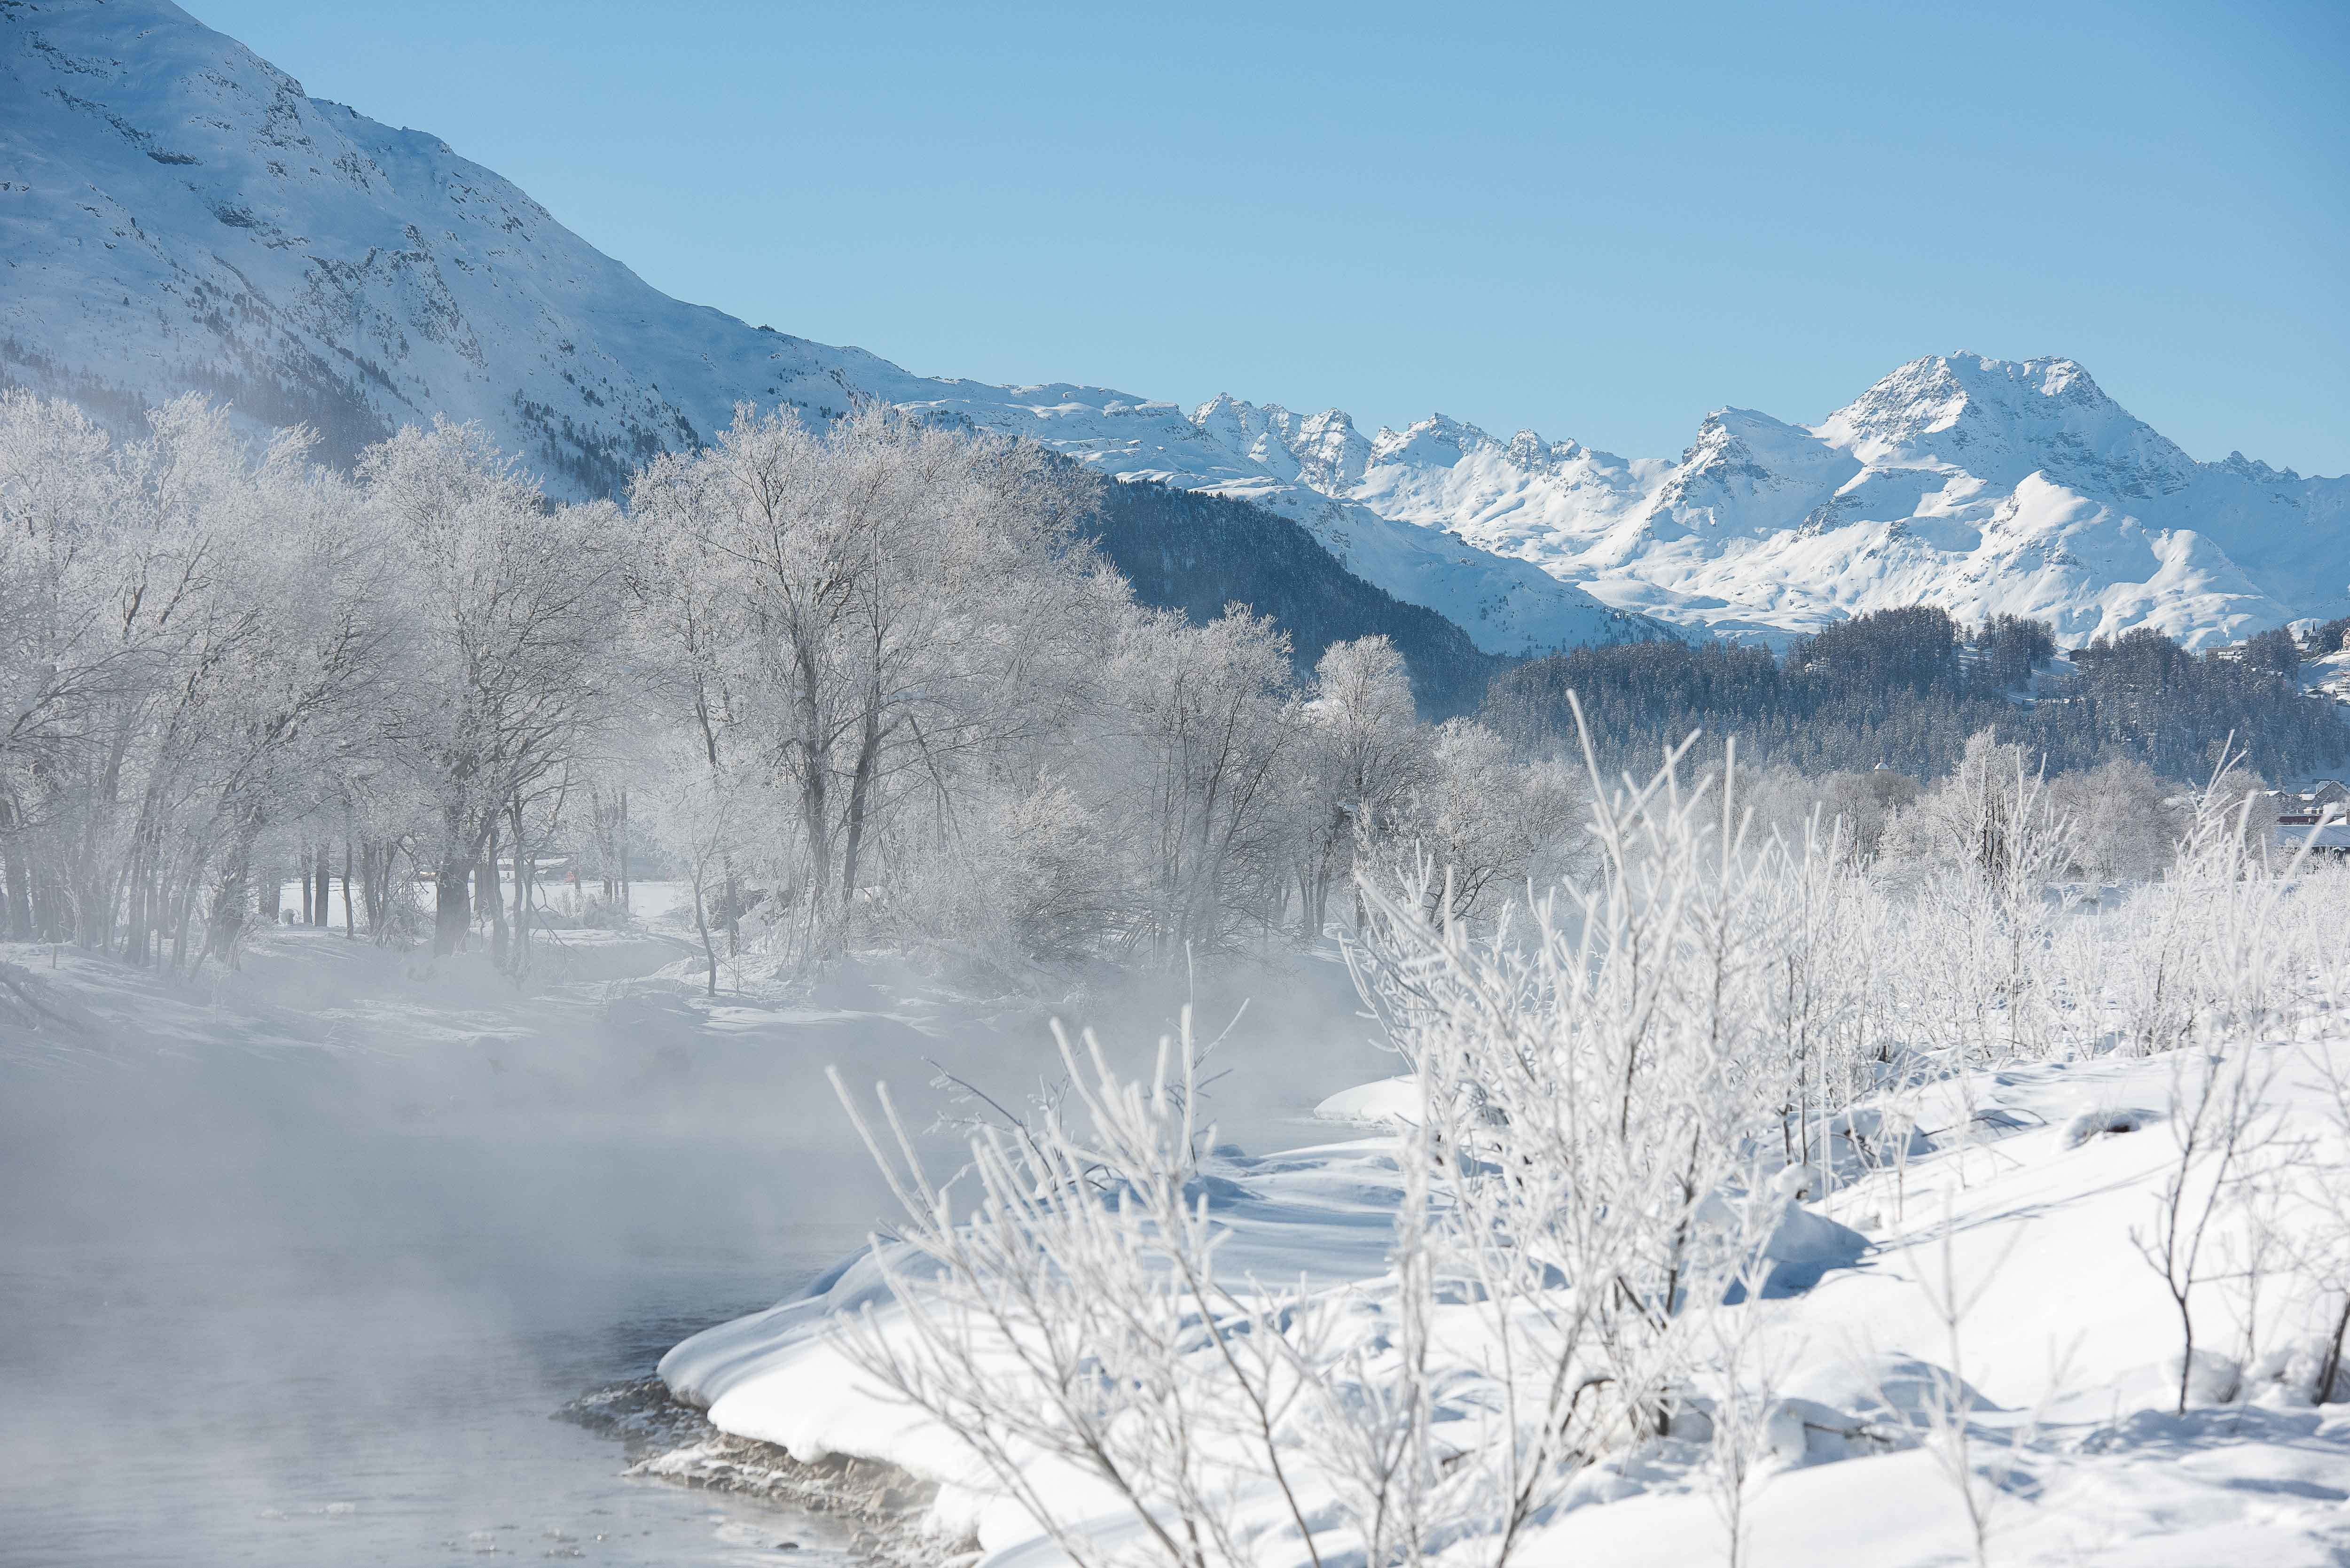 Winter mood captured along the Inn River at Celerina, with views of Piz Kesch (3418 m).